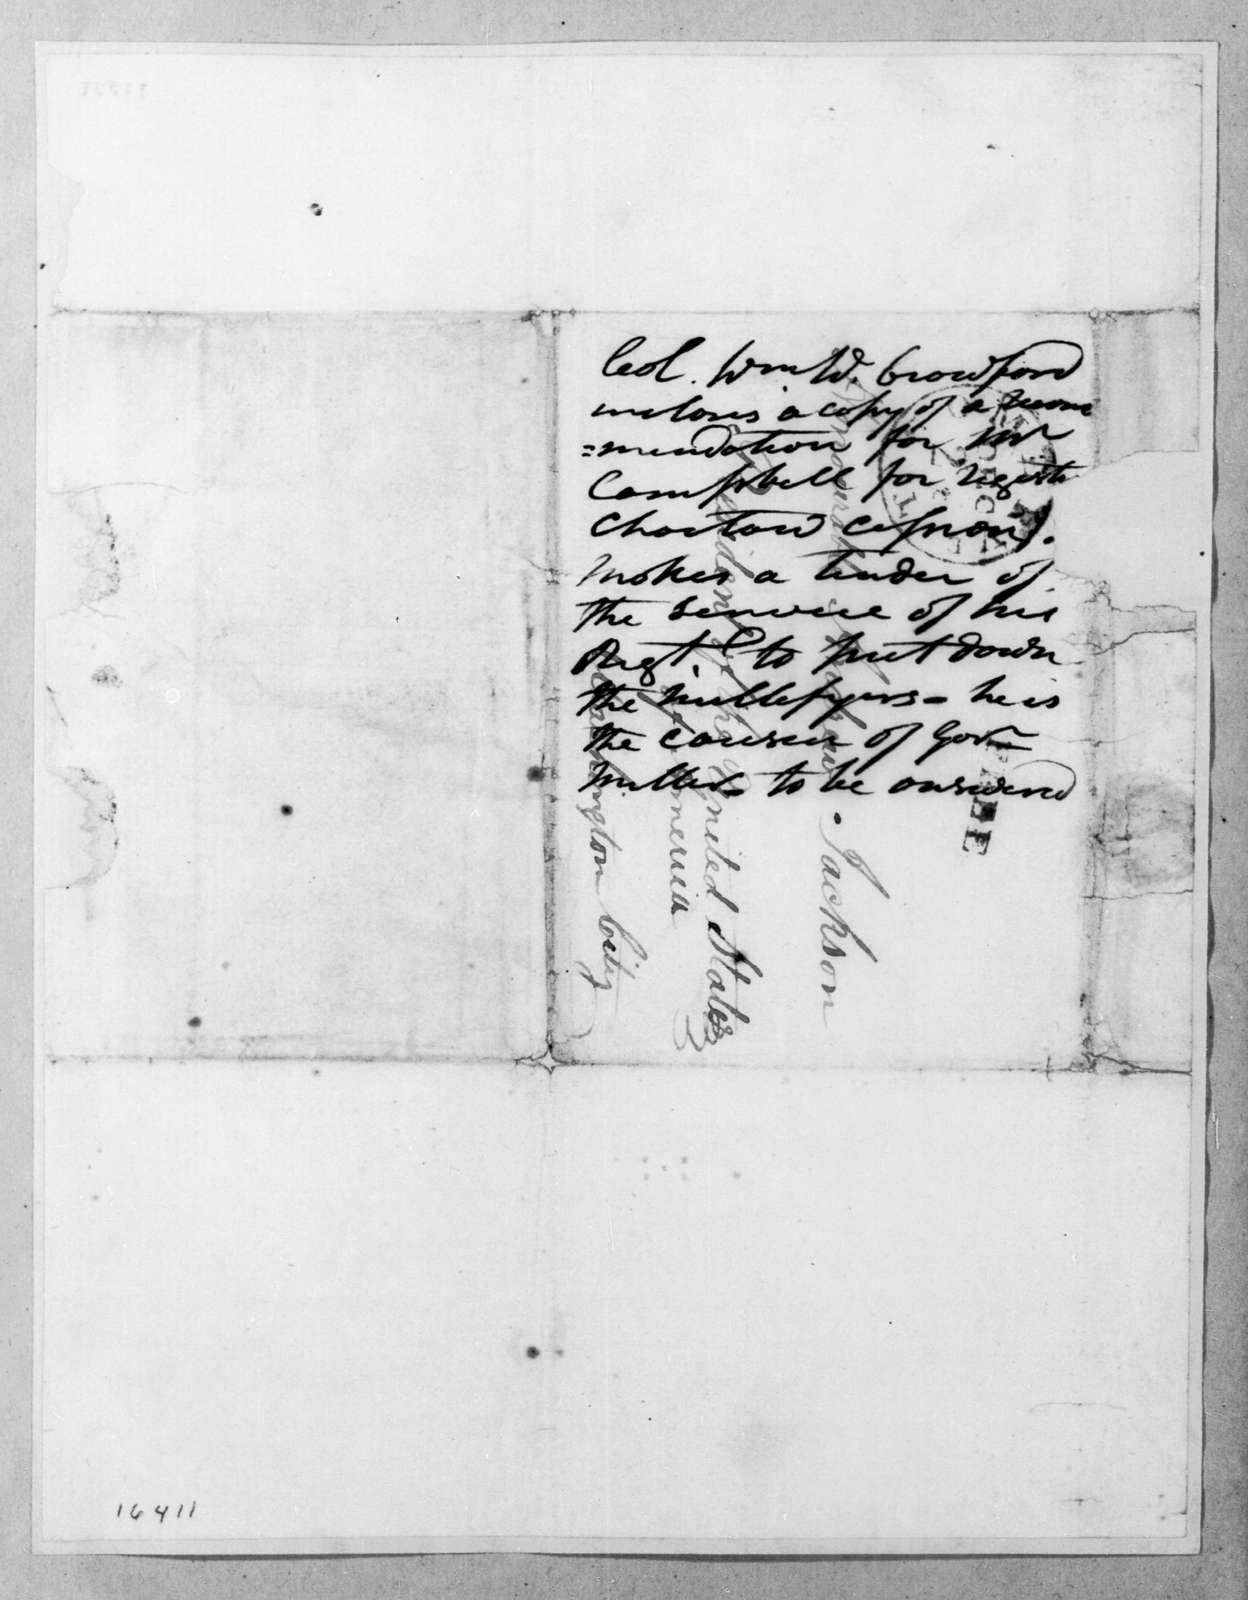 William White Crawford to Andrew Jackson, December 21, 1832